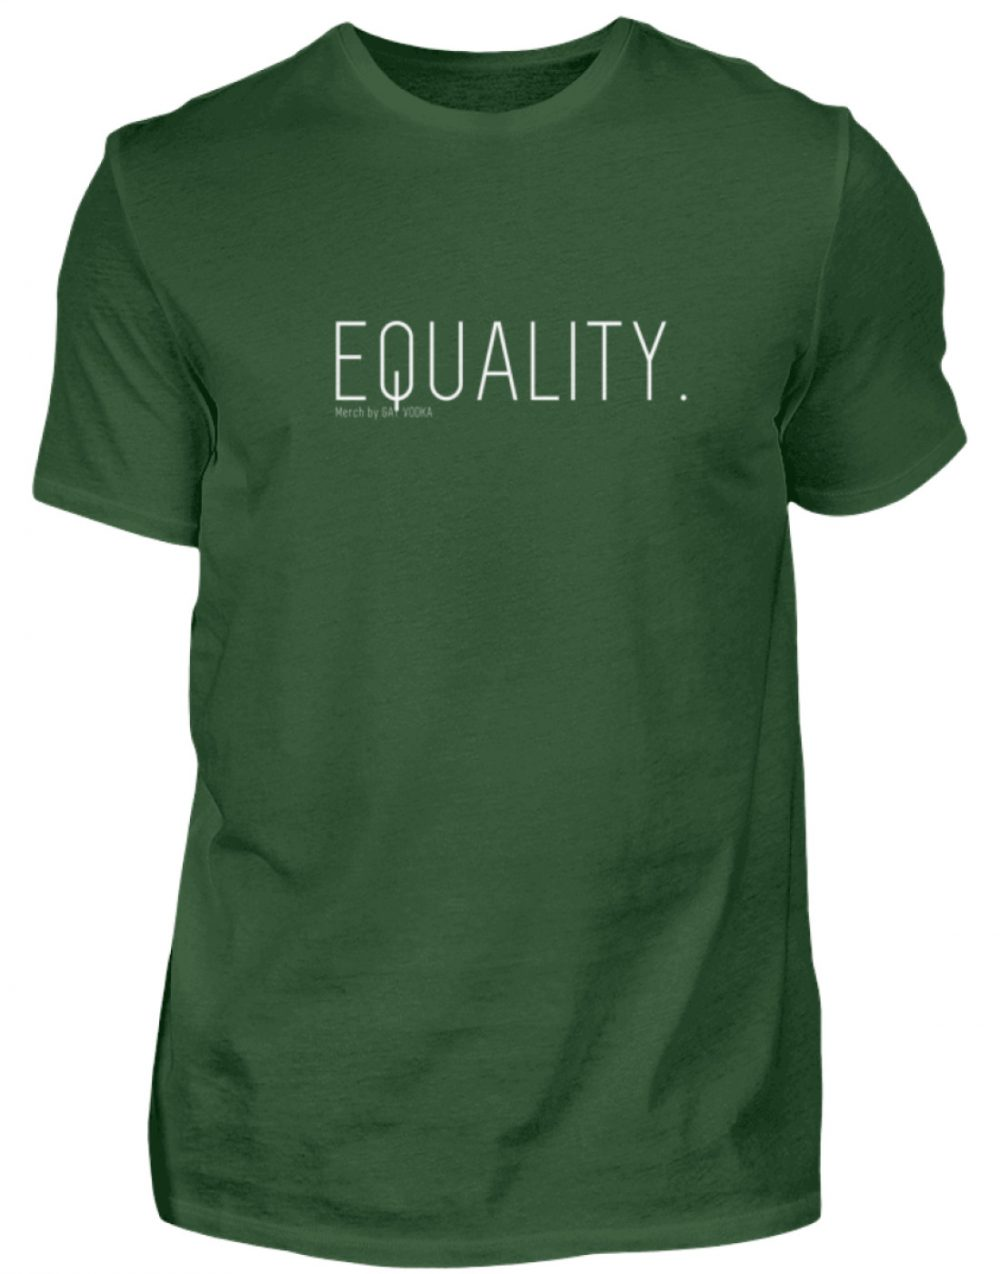 EQUALITY. - Herren Premiumshirt-2936